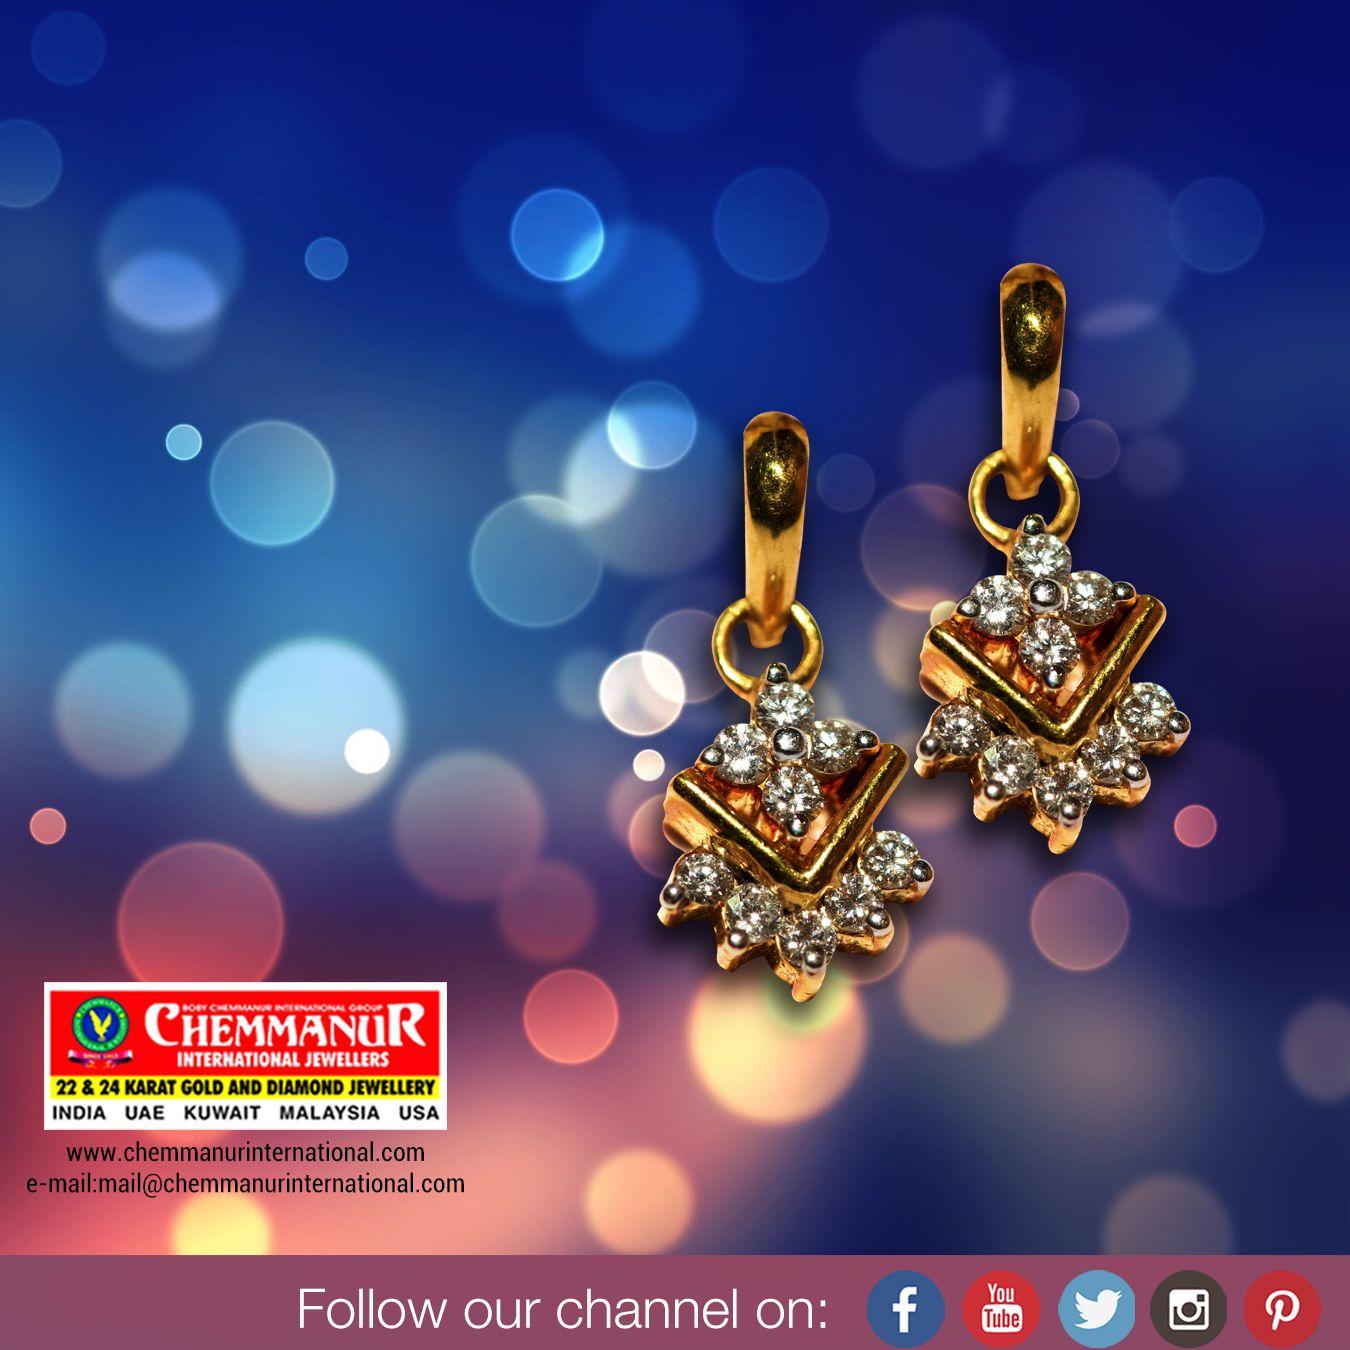 Chemmanur International Jewellers TollFree Number: 1800 3000